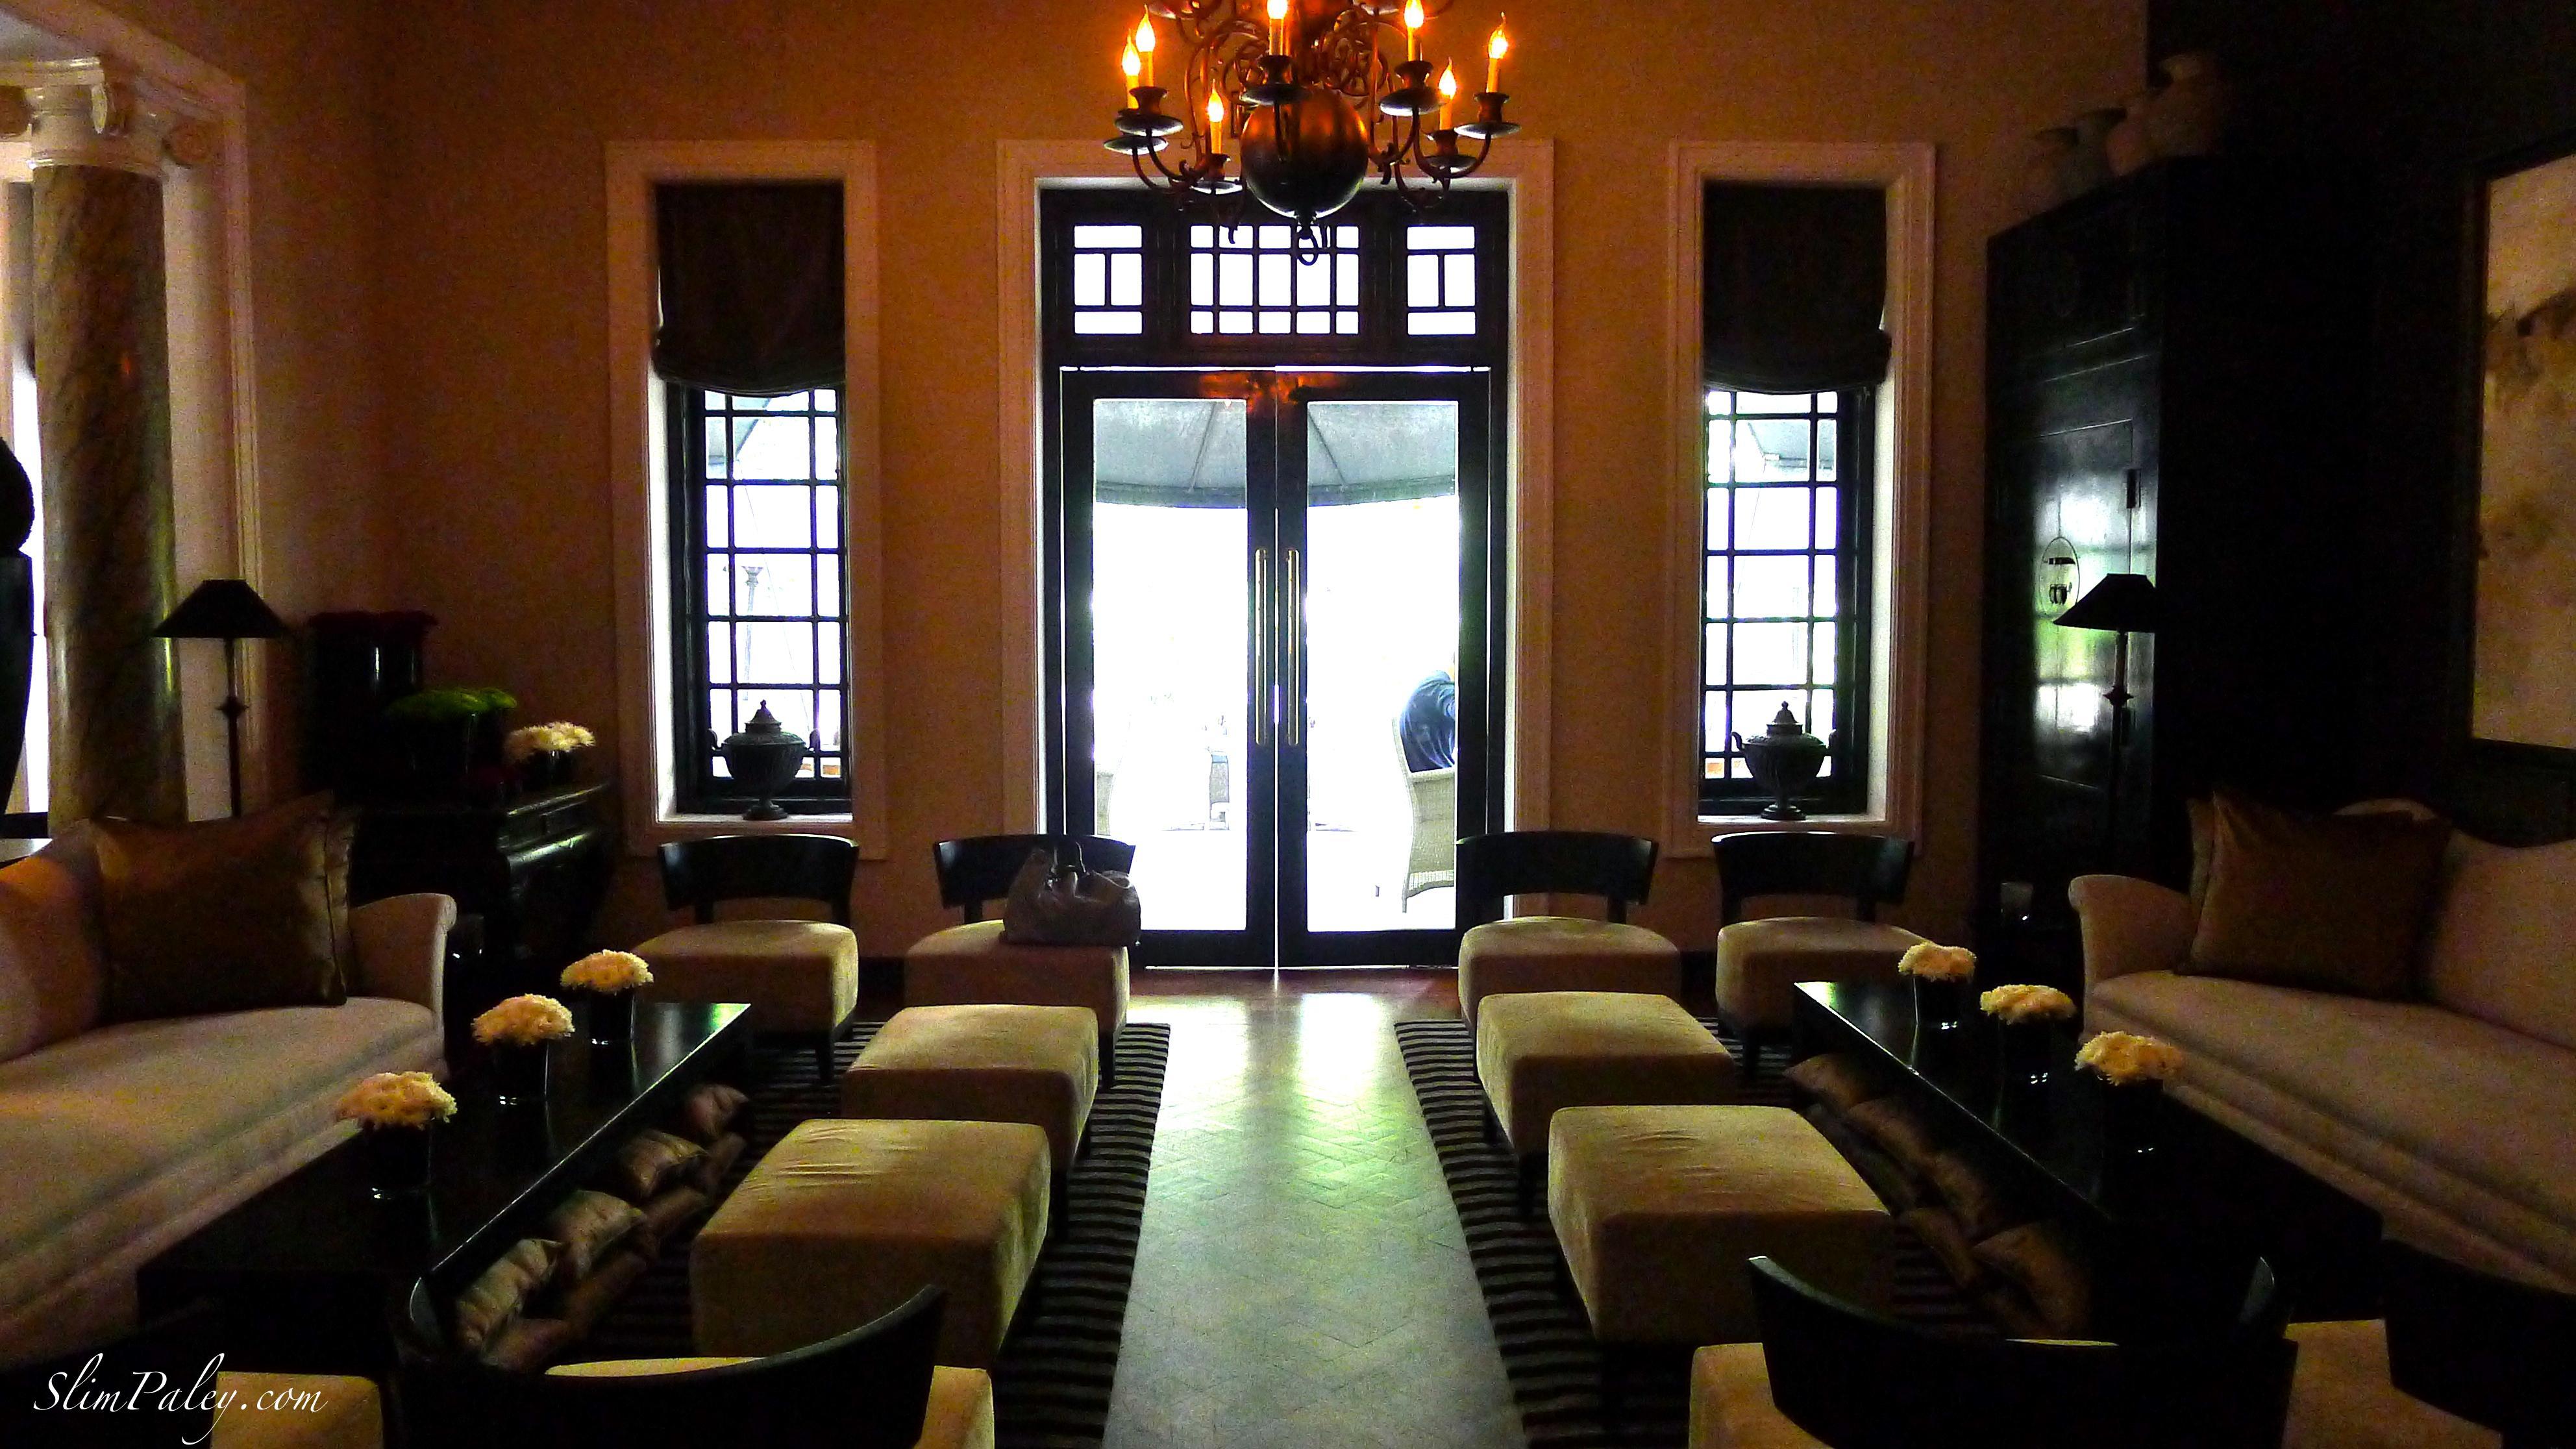 Tintagel Hotel, Colombo, Sril Lanka, slimpaley.com